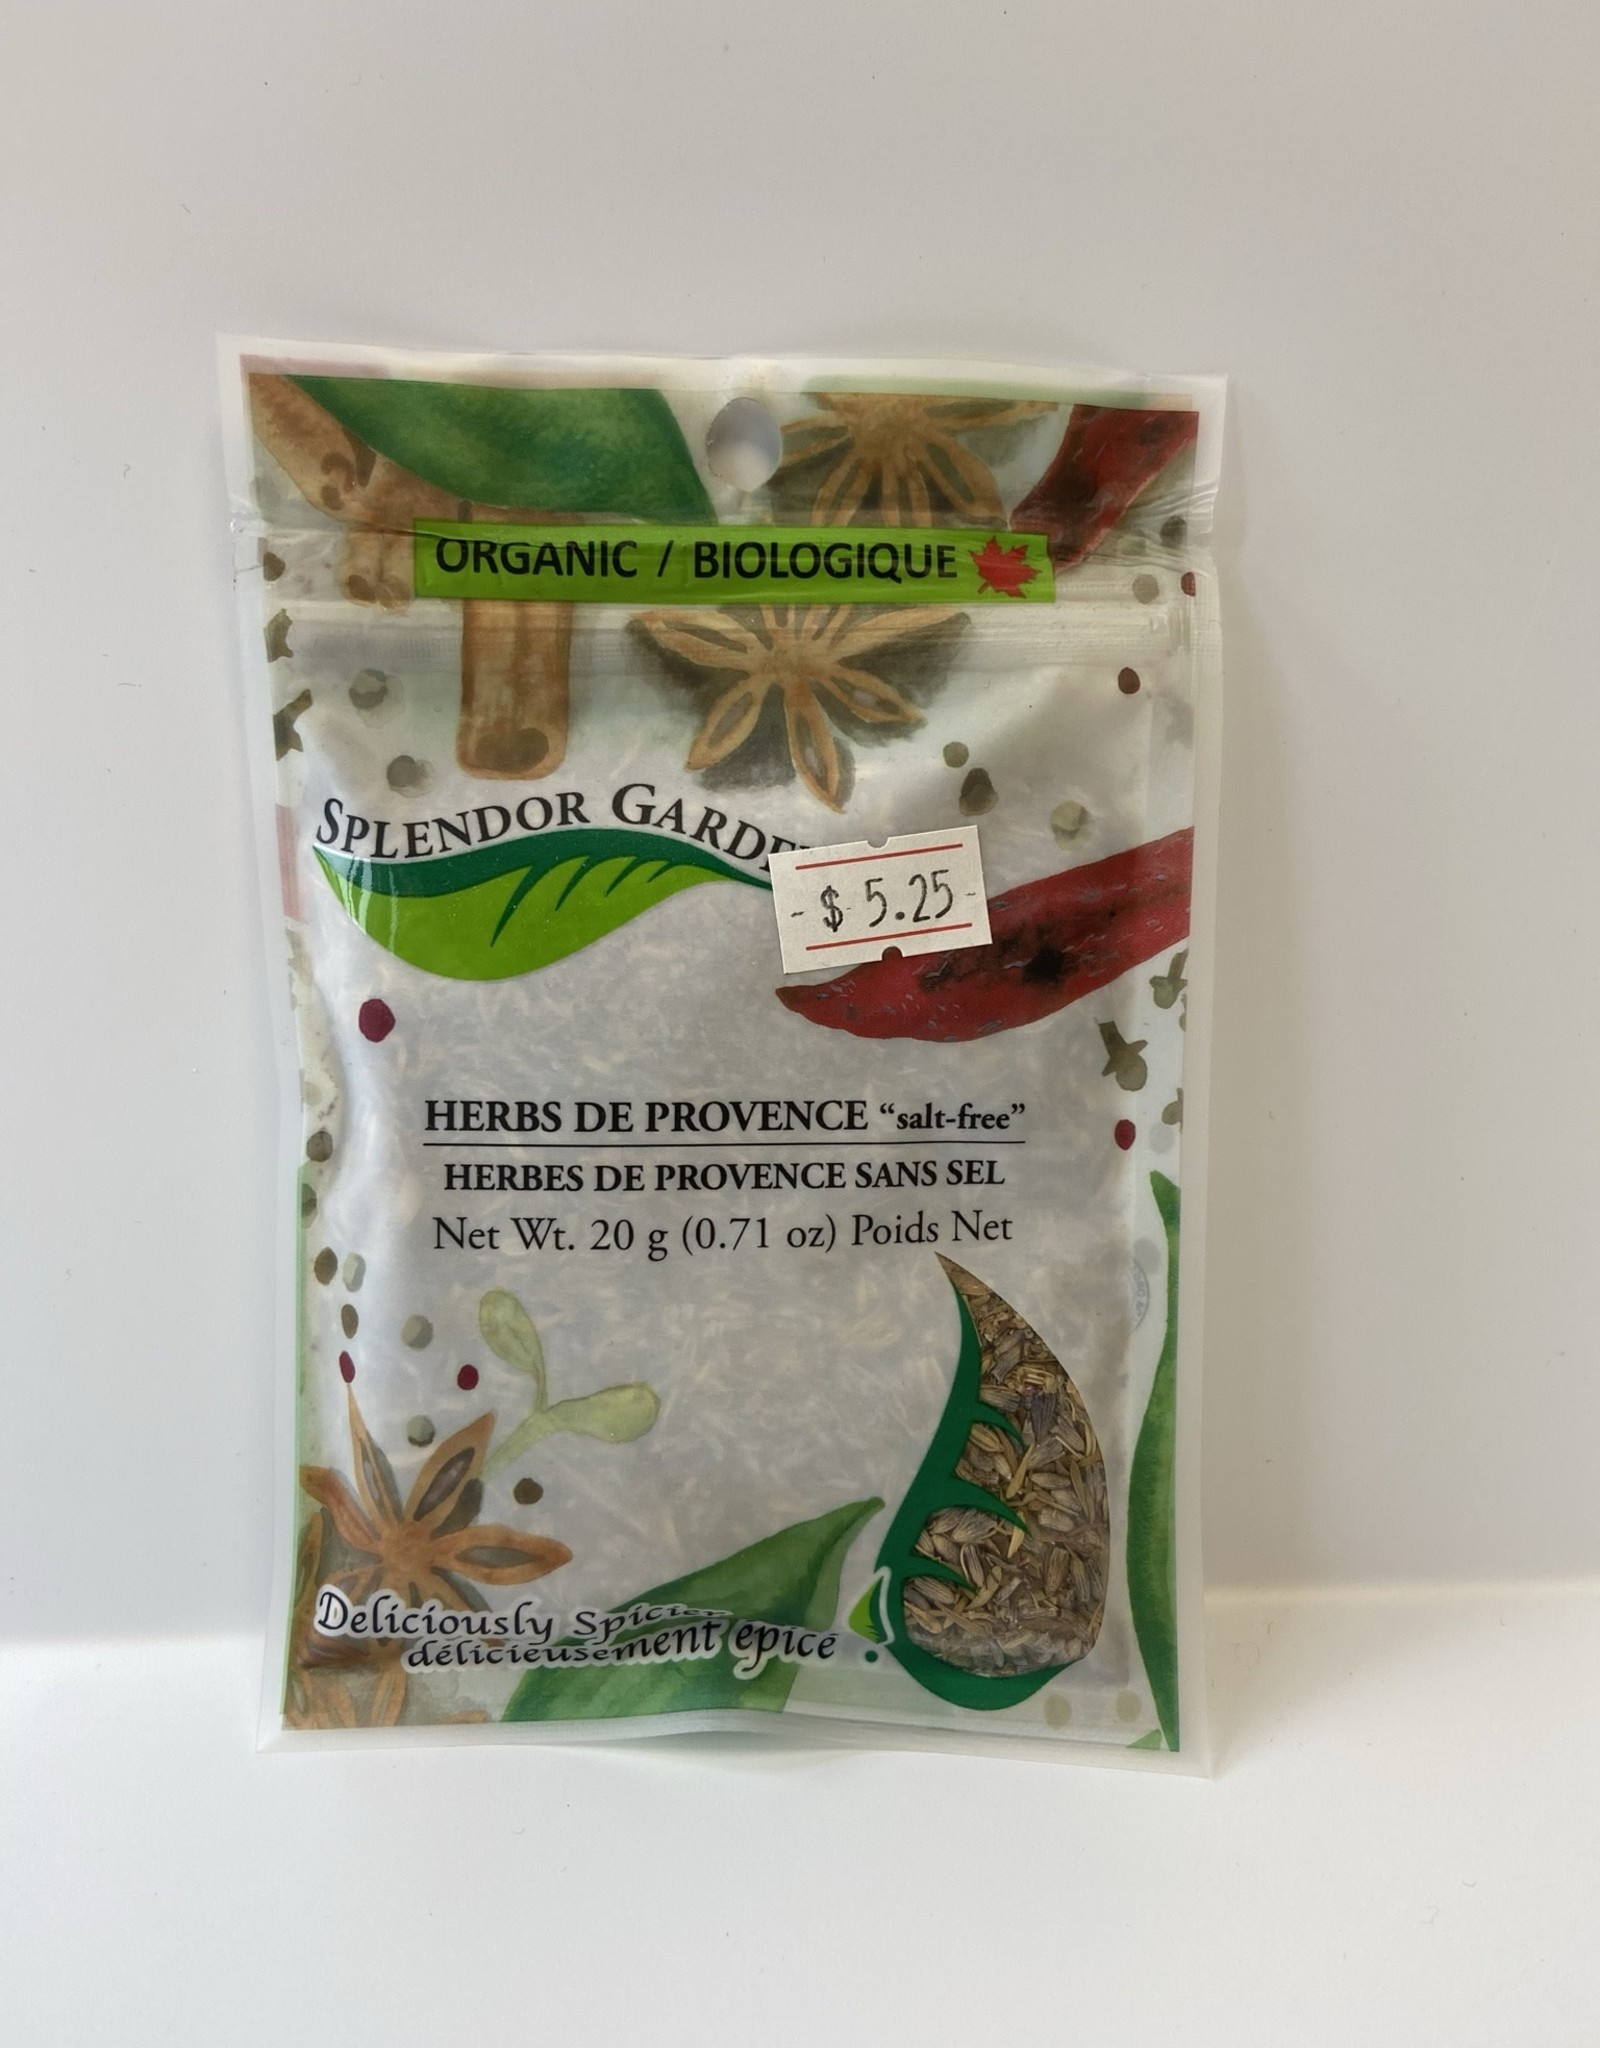 Splendor Garden Splendor Garden - Herbs de Provence Salt Free